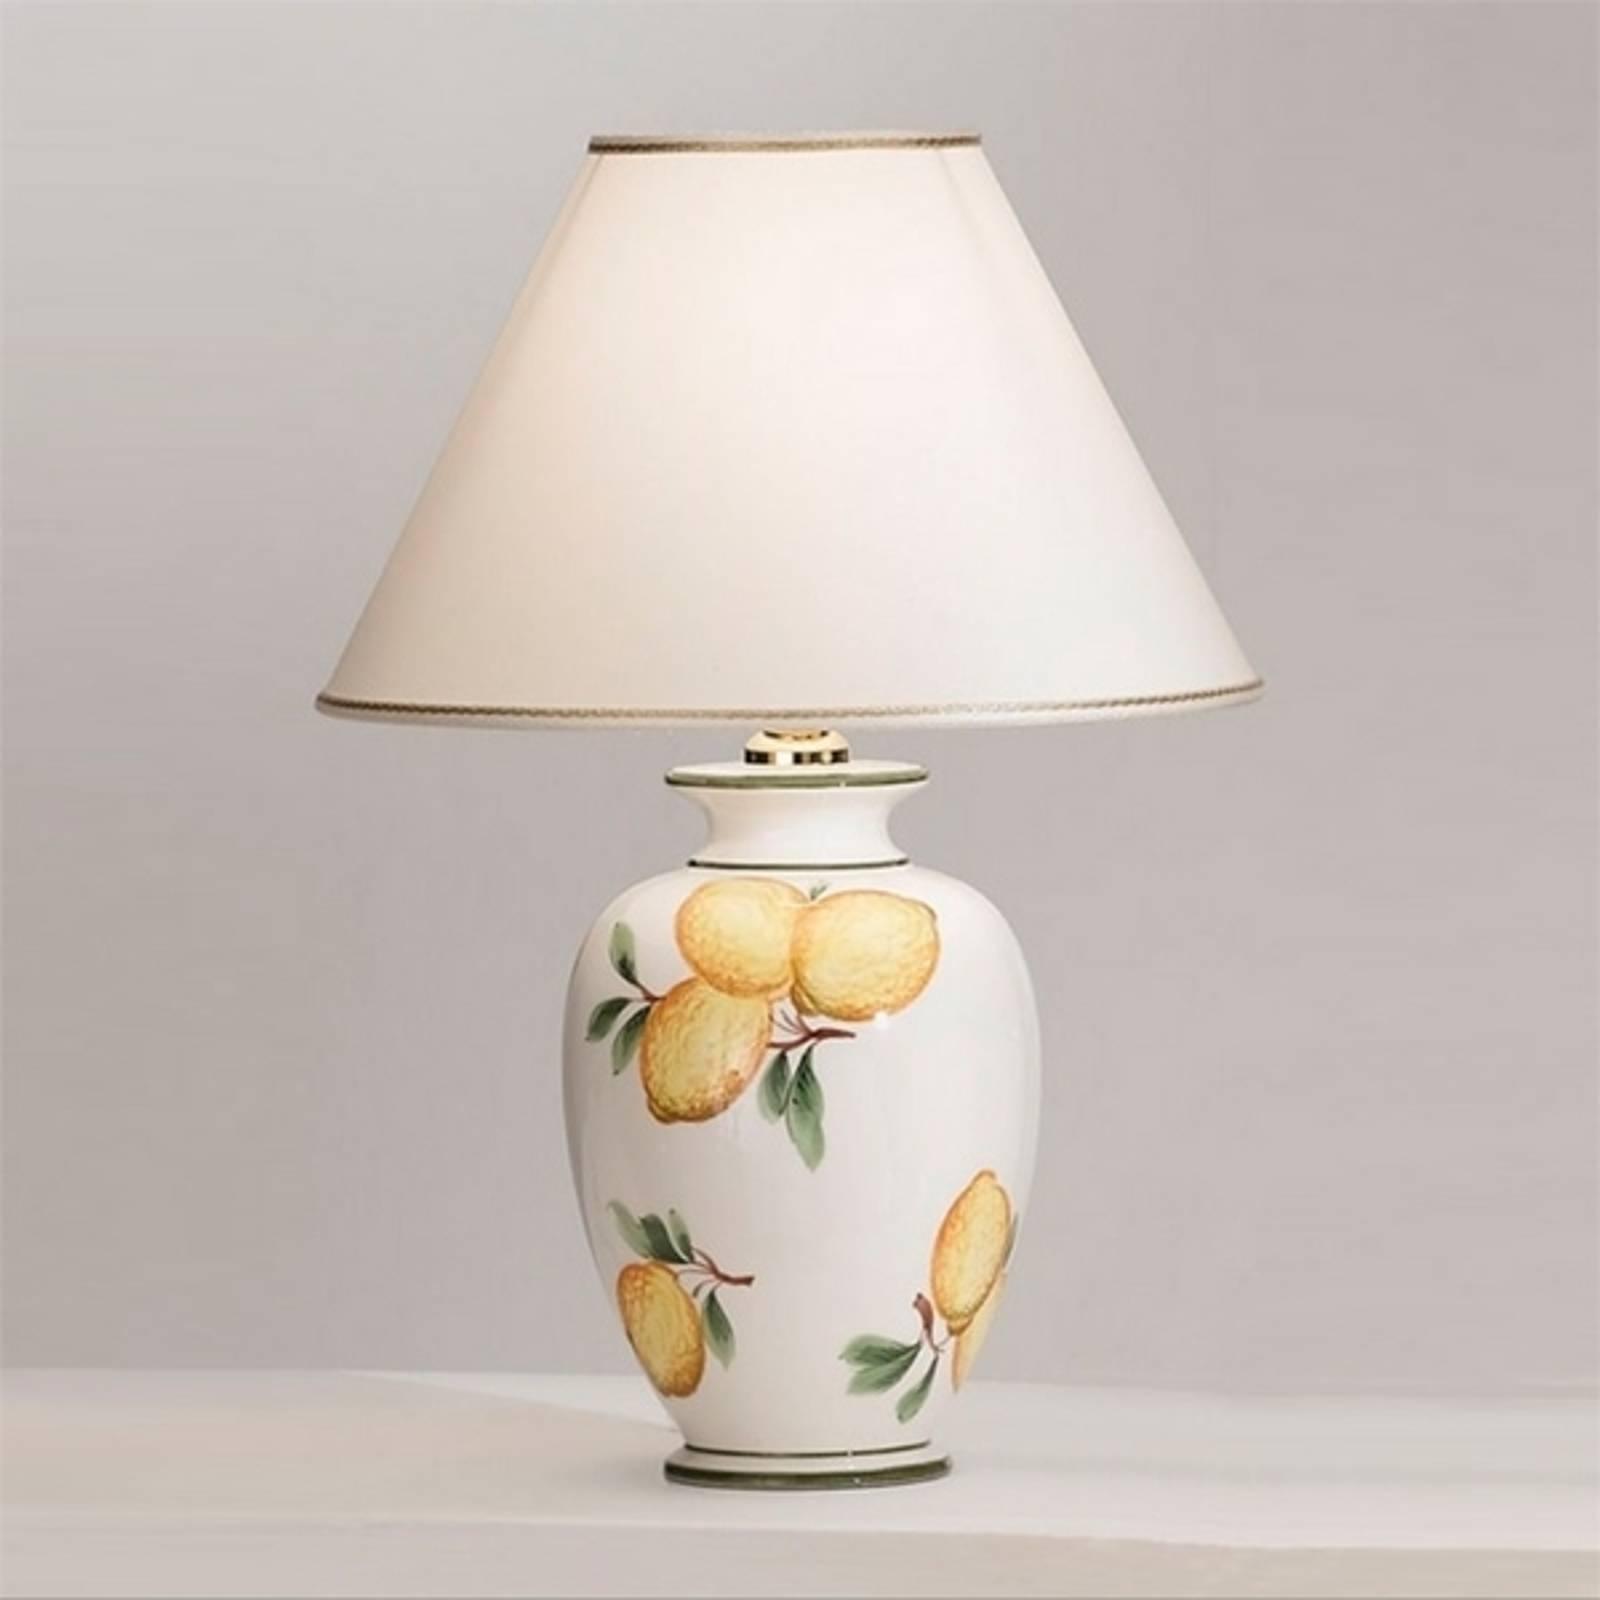 Pöytävalaisin Giardino Lemone, Ø 30 cm